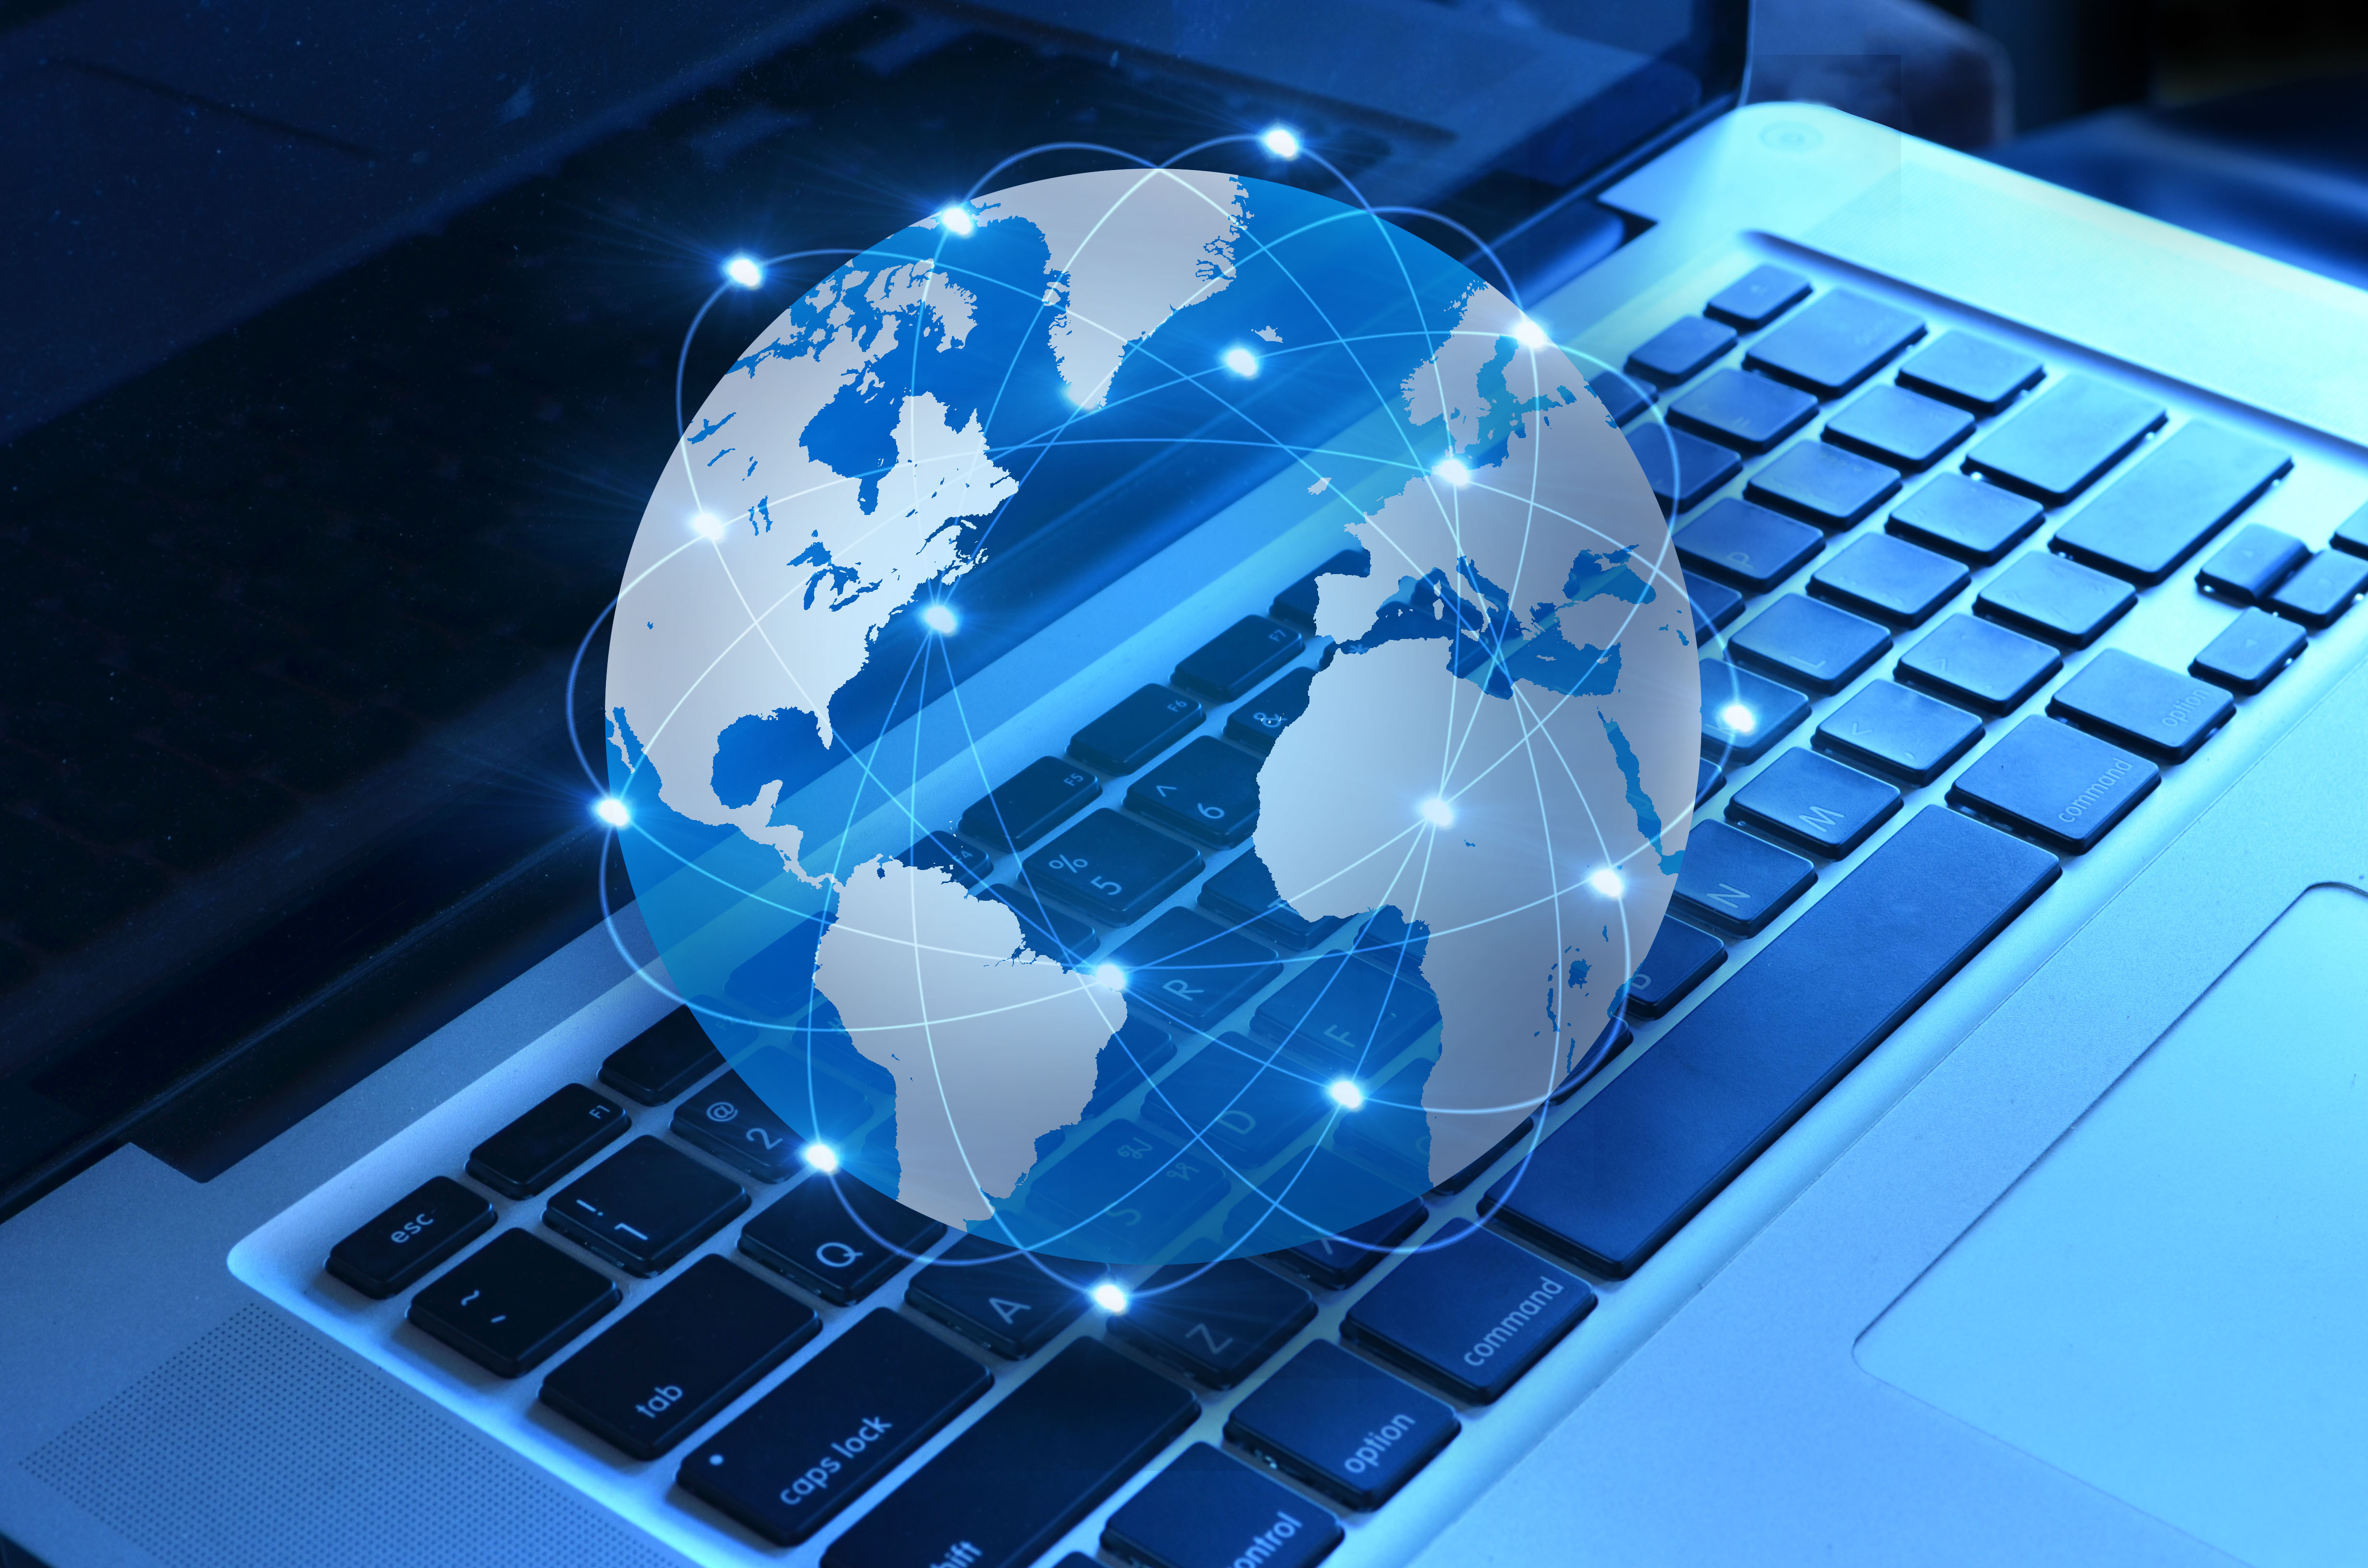 internet_keyboard-100042718-orig